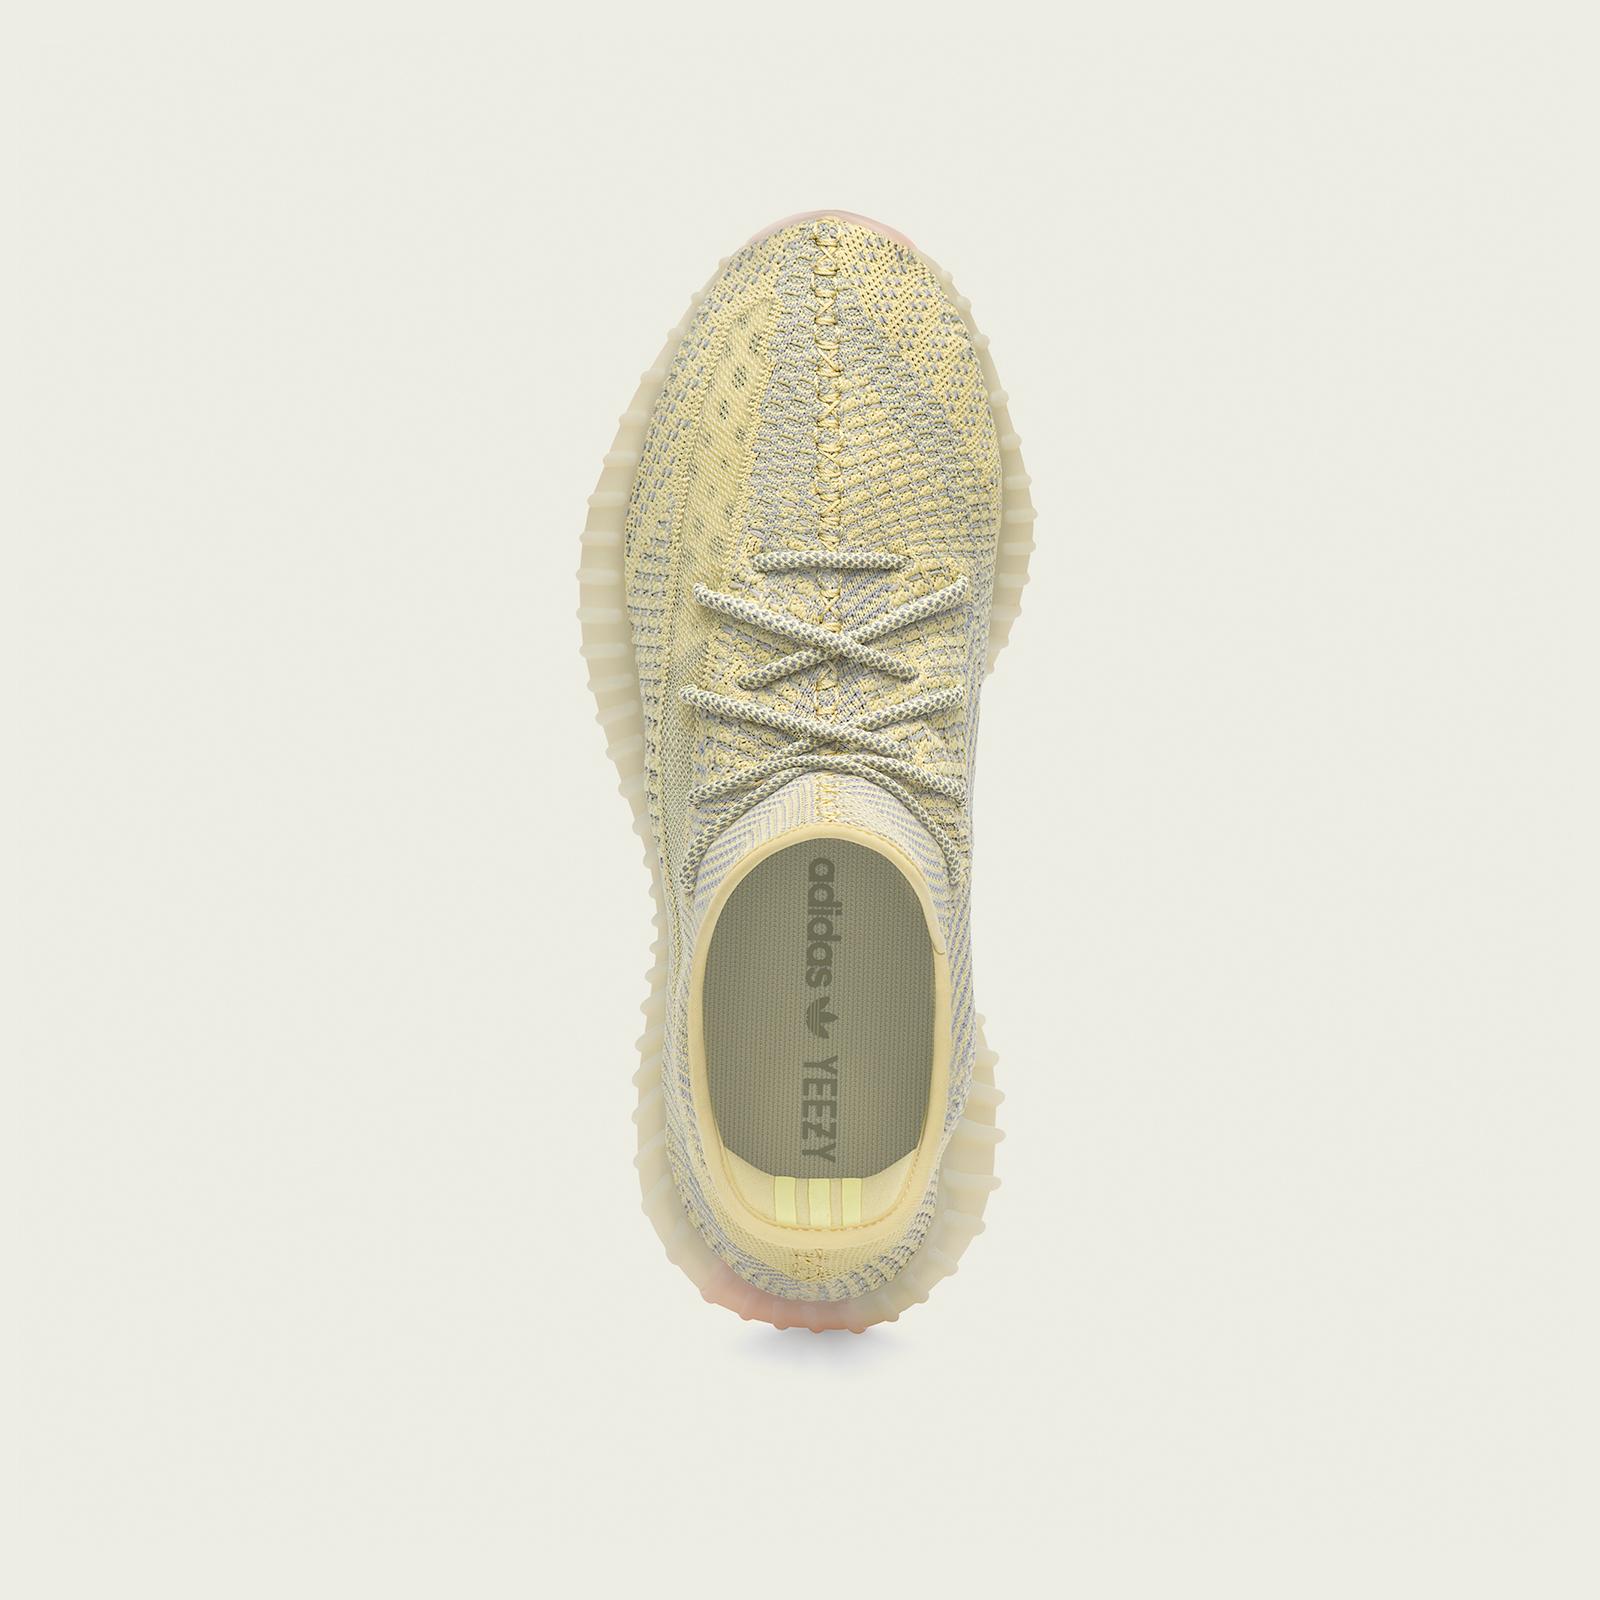 adidas Yeezy Boost 350 V2 Fv3250 Sneakersnstuff